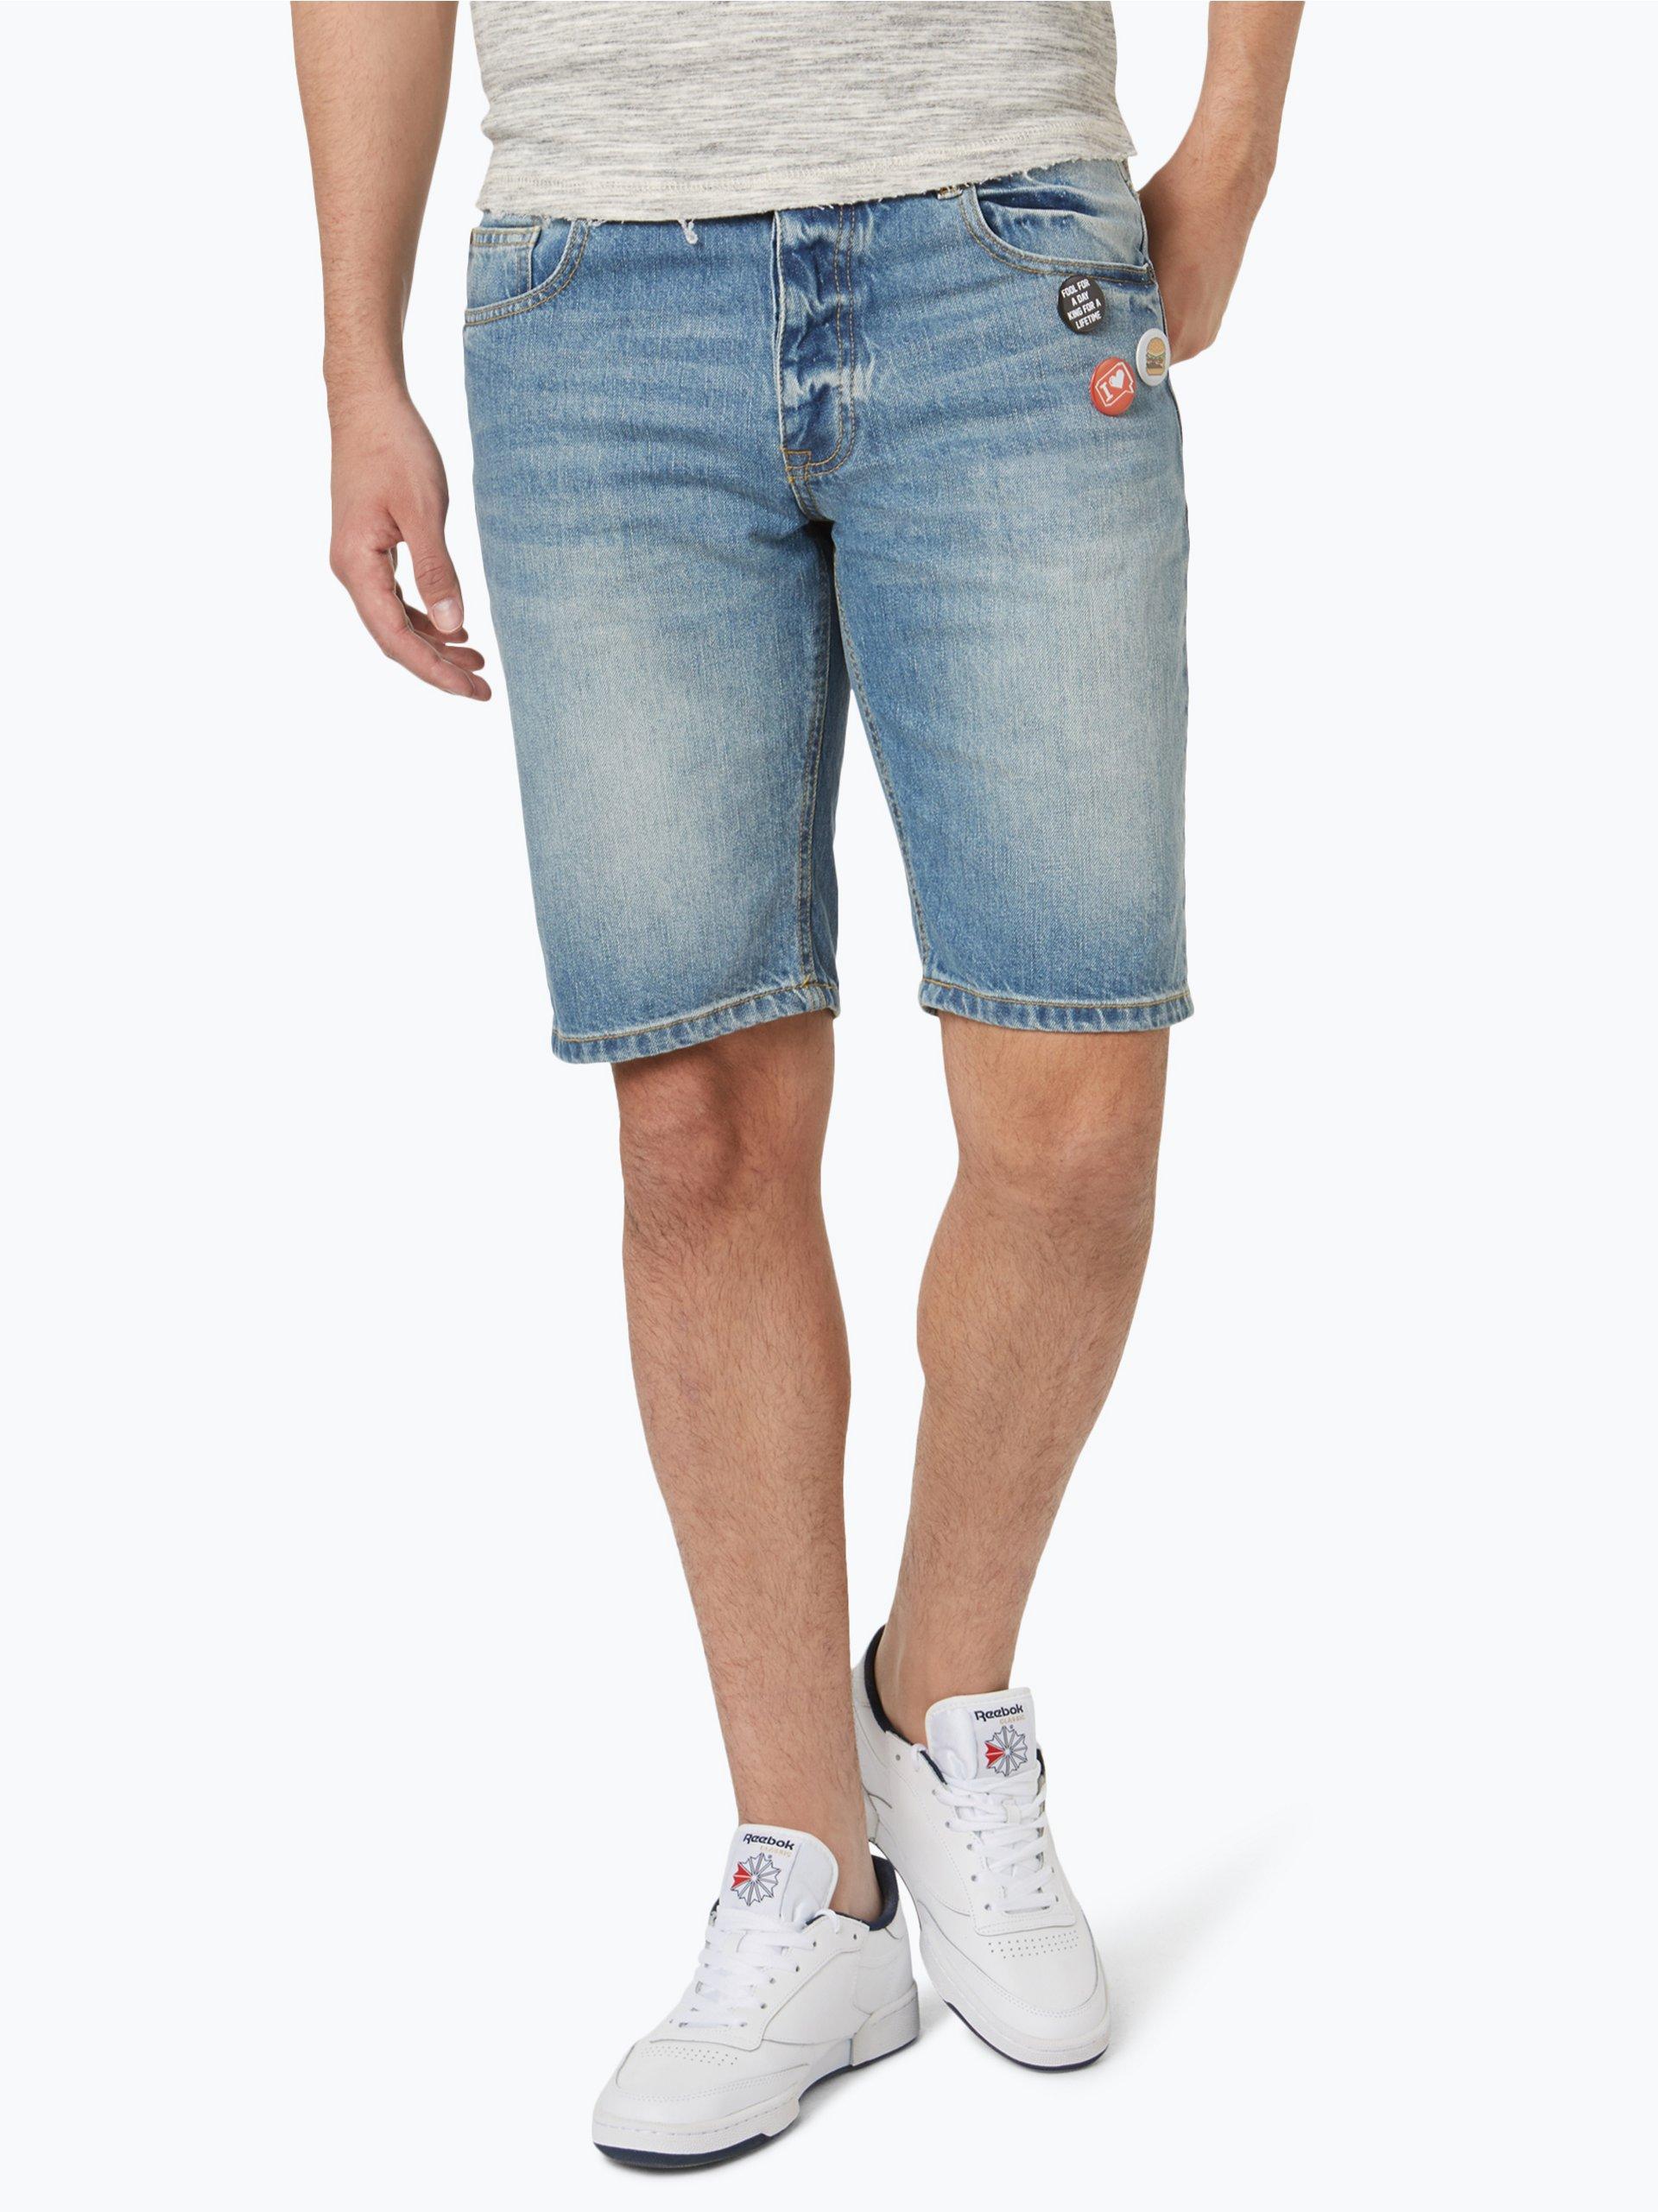 review herren jeans bermuda indigo uni online kaufen vangraaf com. Black Bedroom Furniture Sets. Home Design Ideas